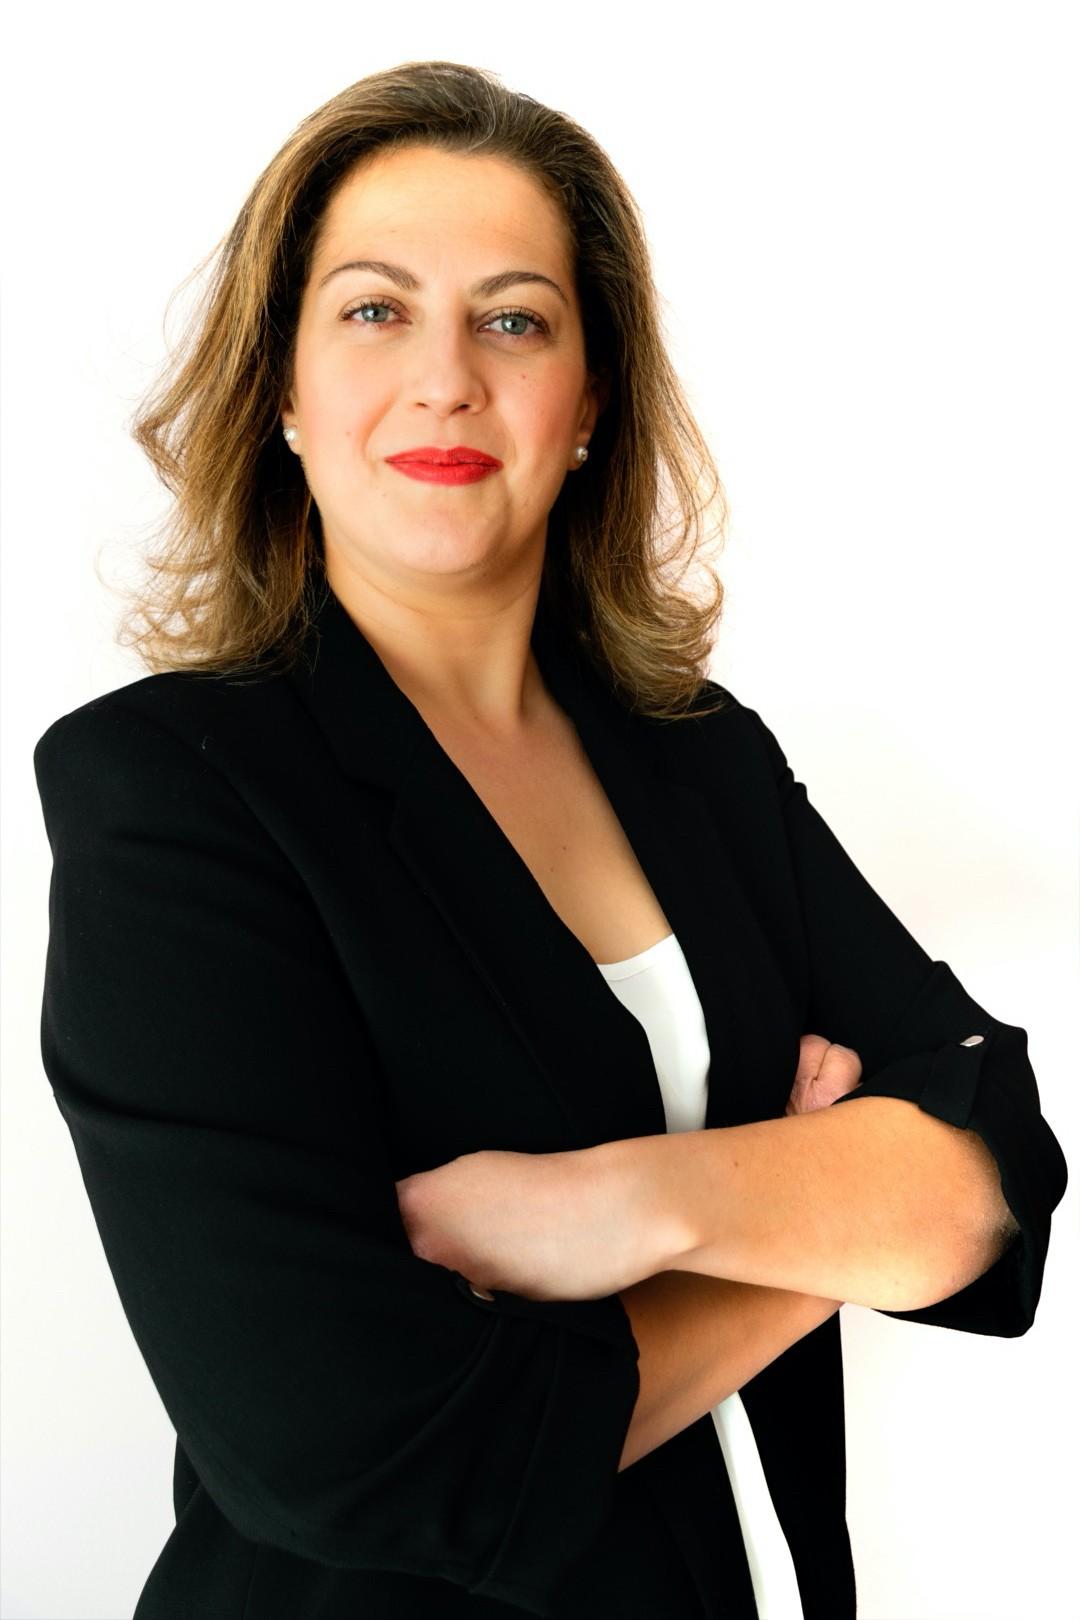 Beatriz Royuela Casén